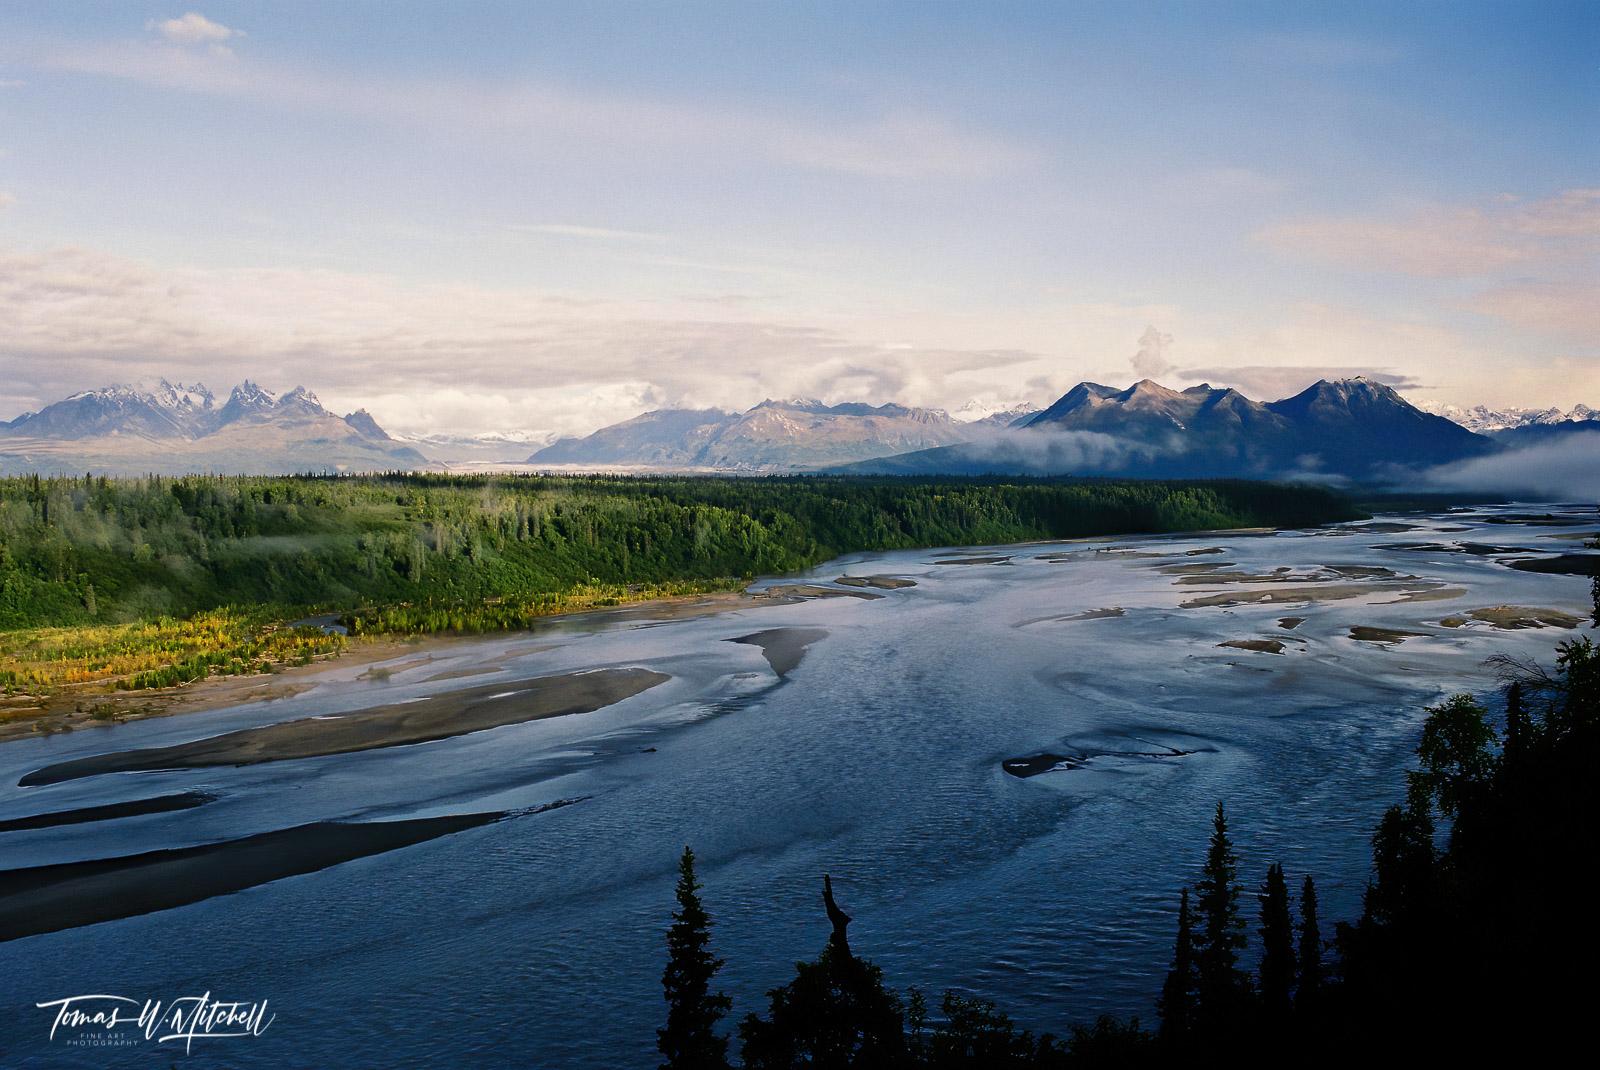 limited edition, fine art, prints, photograph, film, Alaska, susitna river, river, denali, nikon, mountain, clouds, scenic, anchorage, , photo